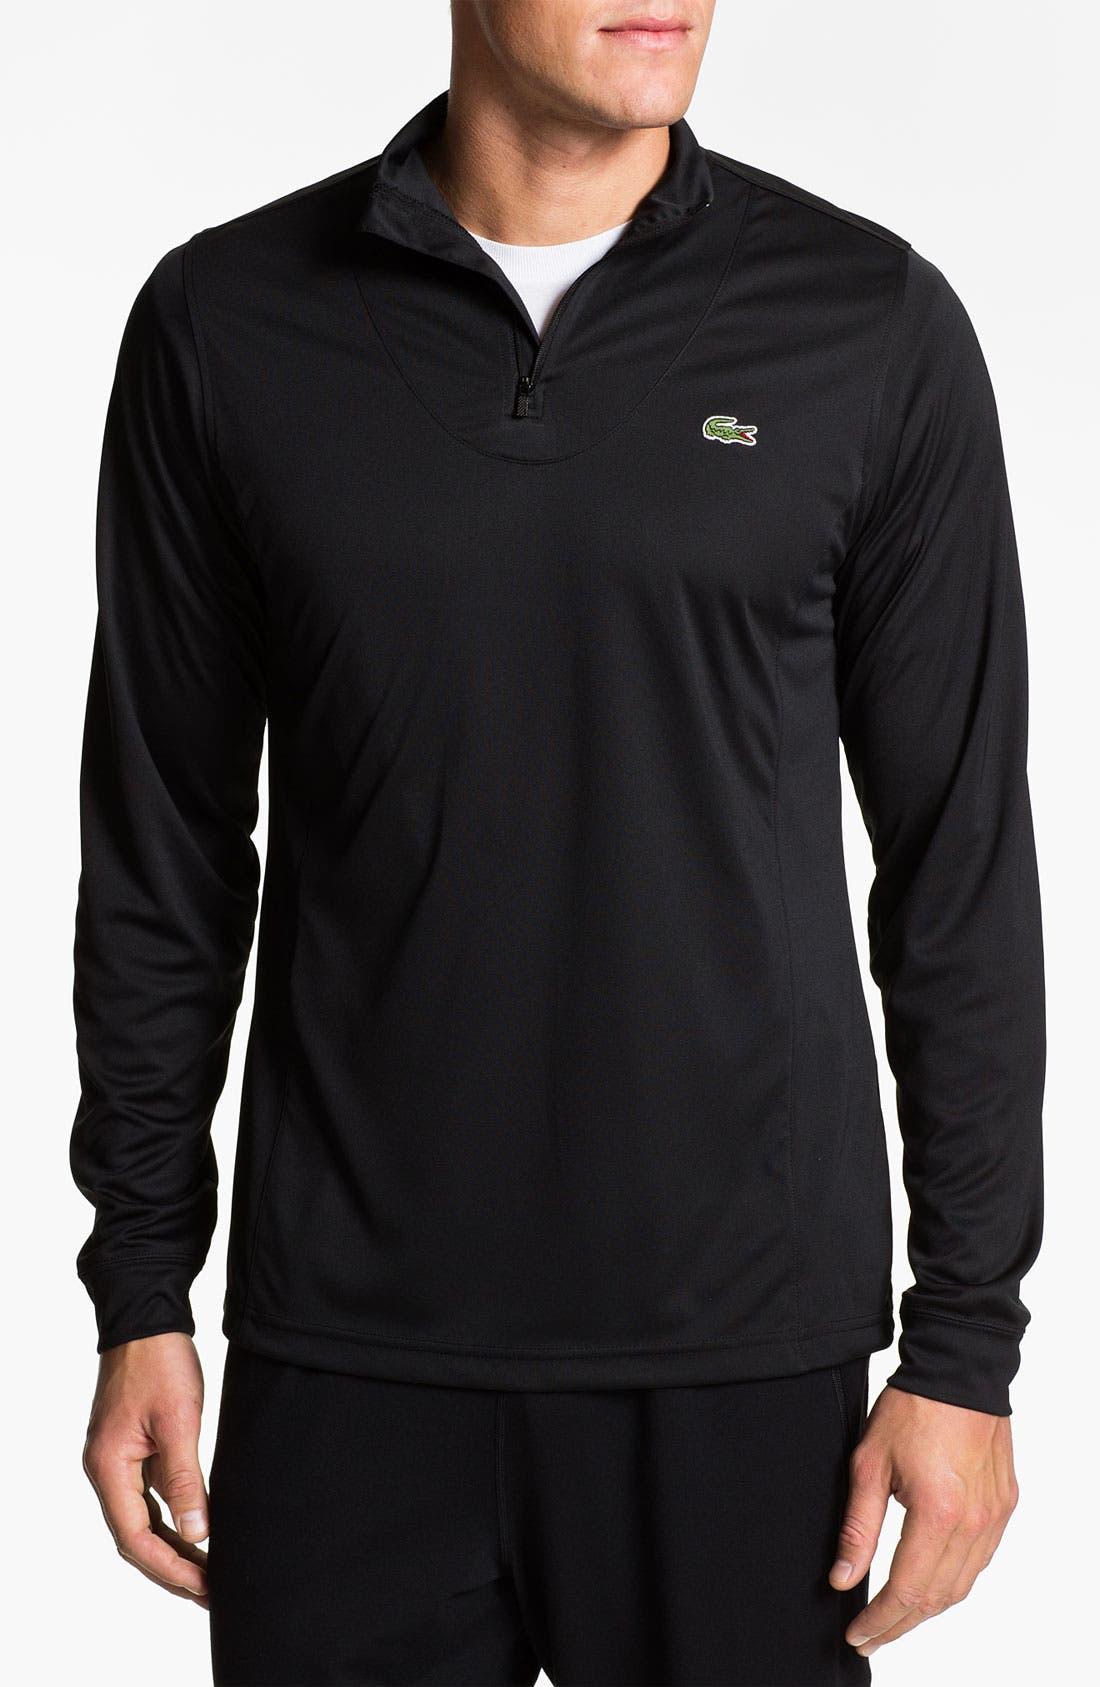 Main Image - Lacoste 'Super Dry' Quarter Zip Shirt